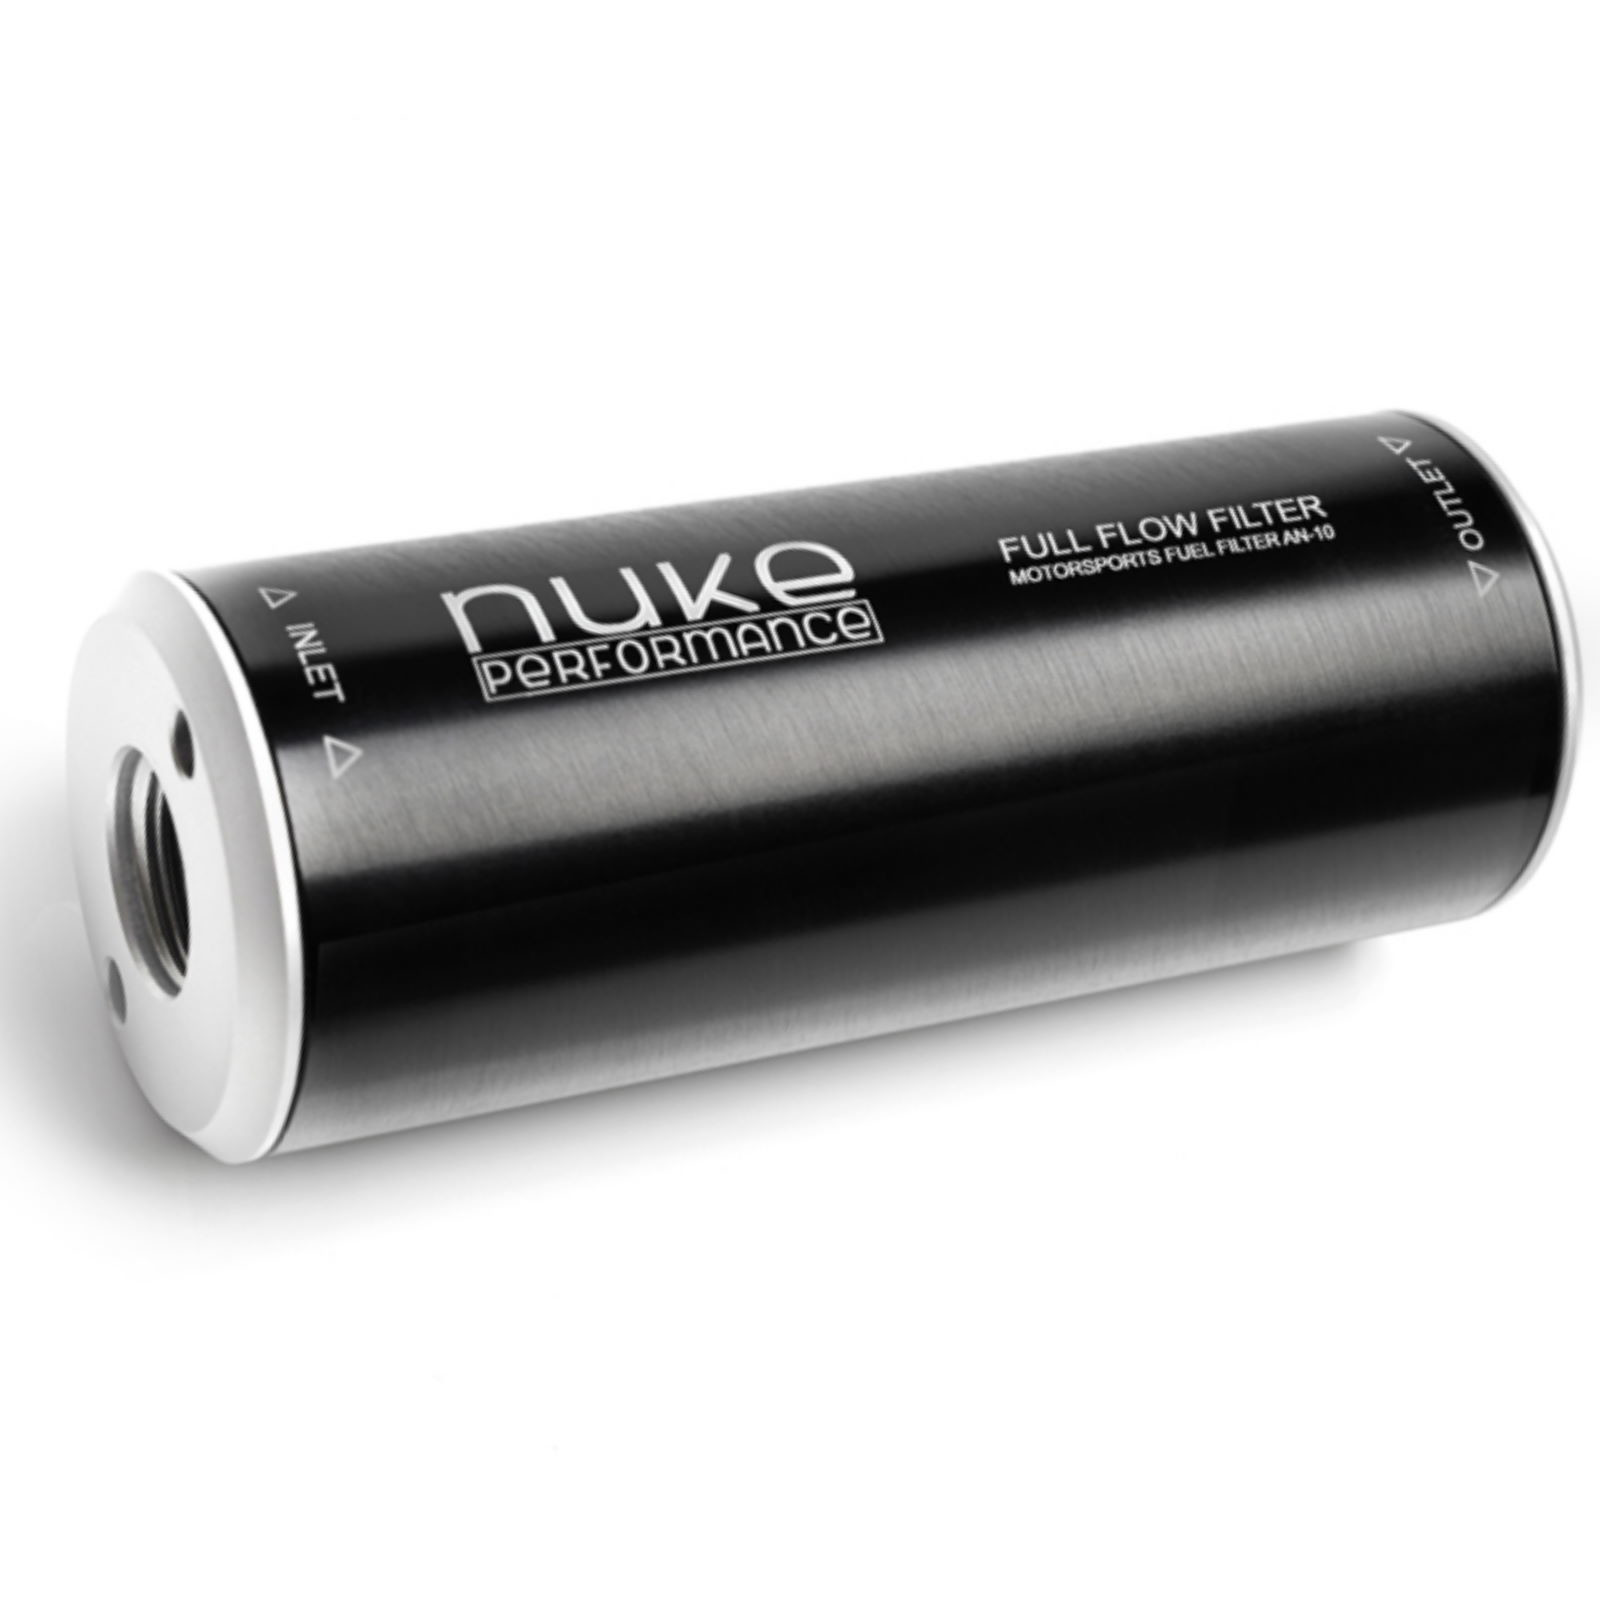 NUKE Performance Benzinfilter Slim 100 micron, 163,03 €